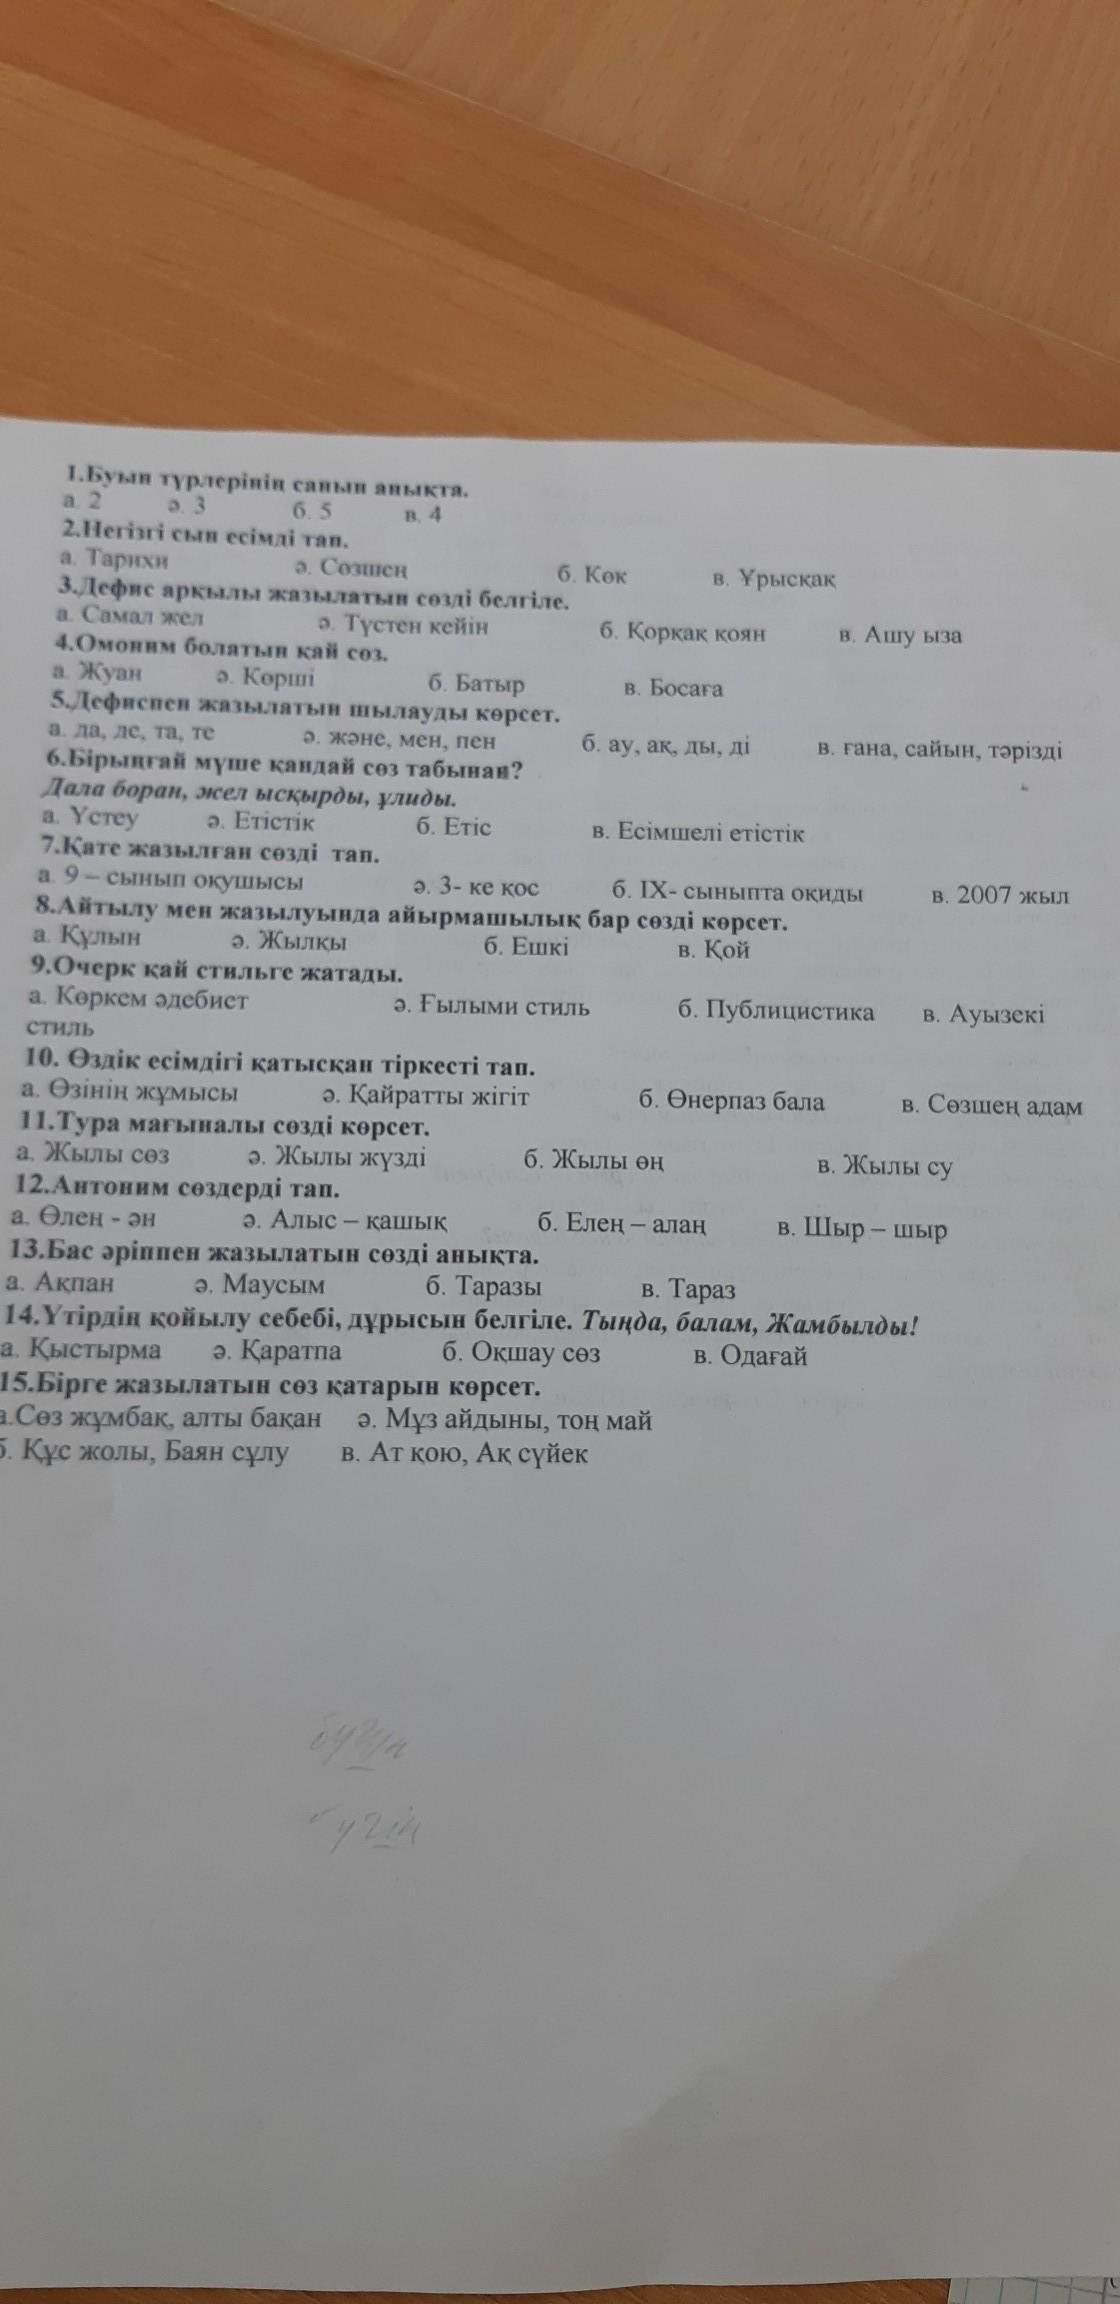 Помогите срочно)))))))